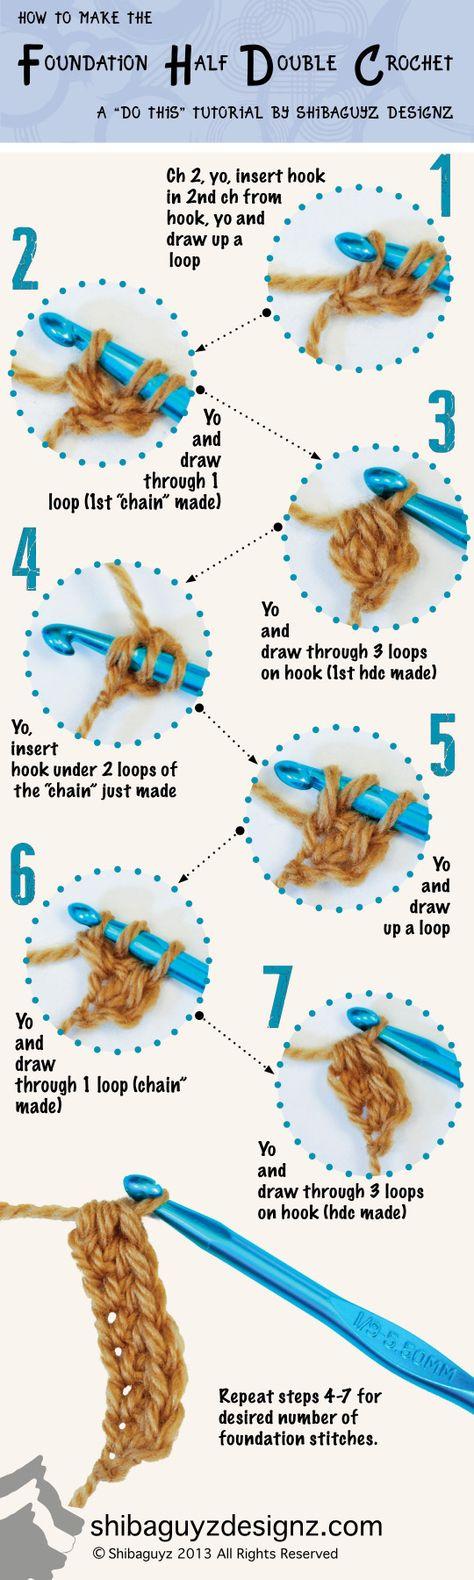 Foundation Half Double Crochet Infographic